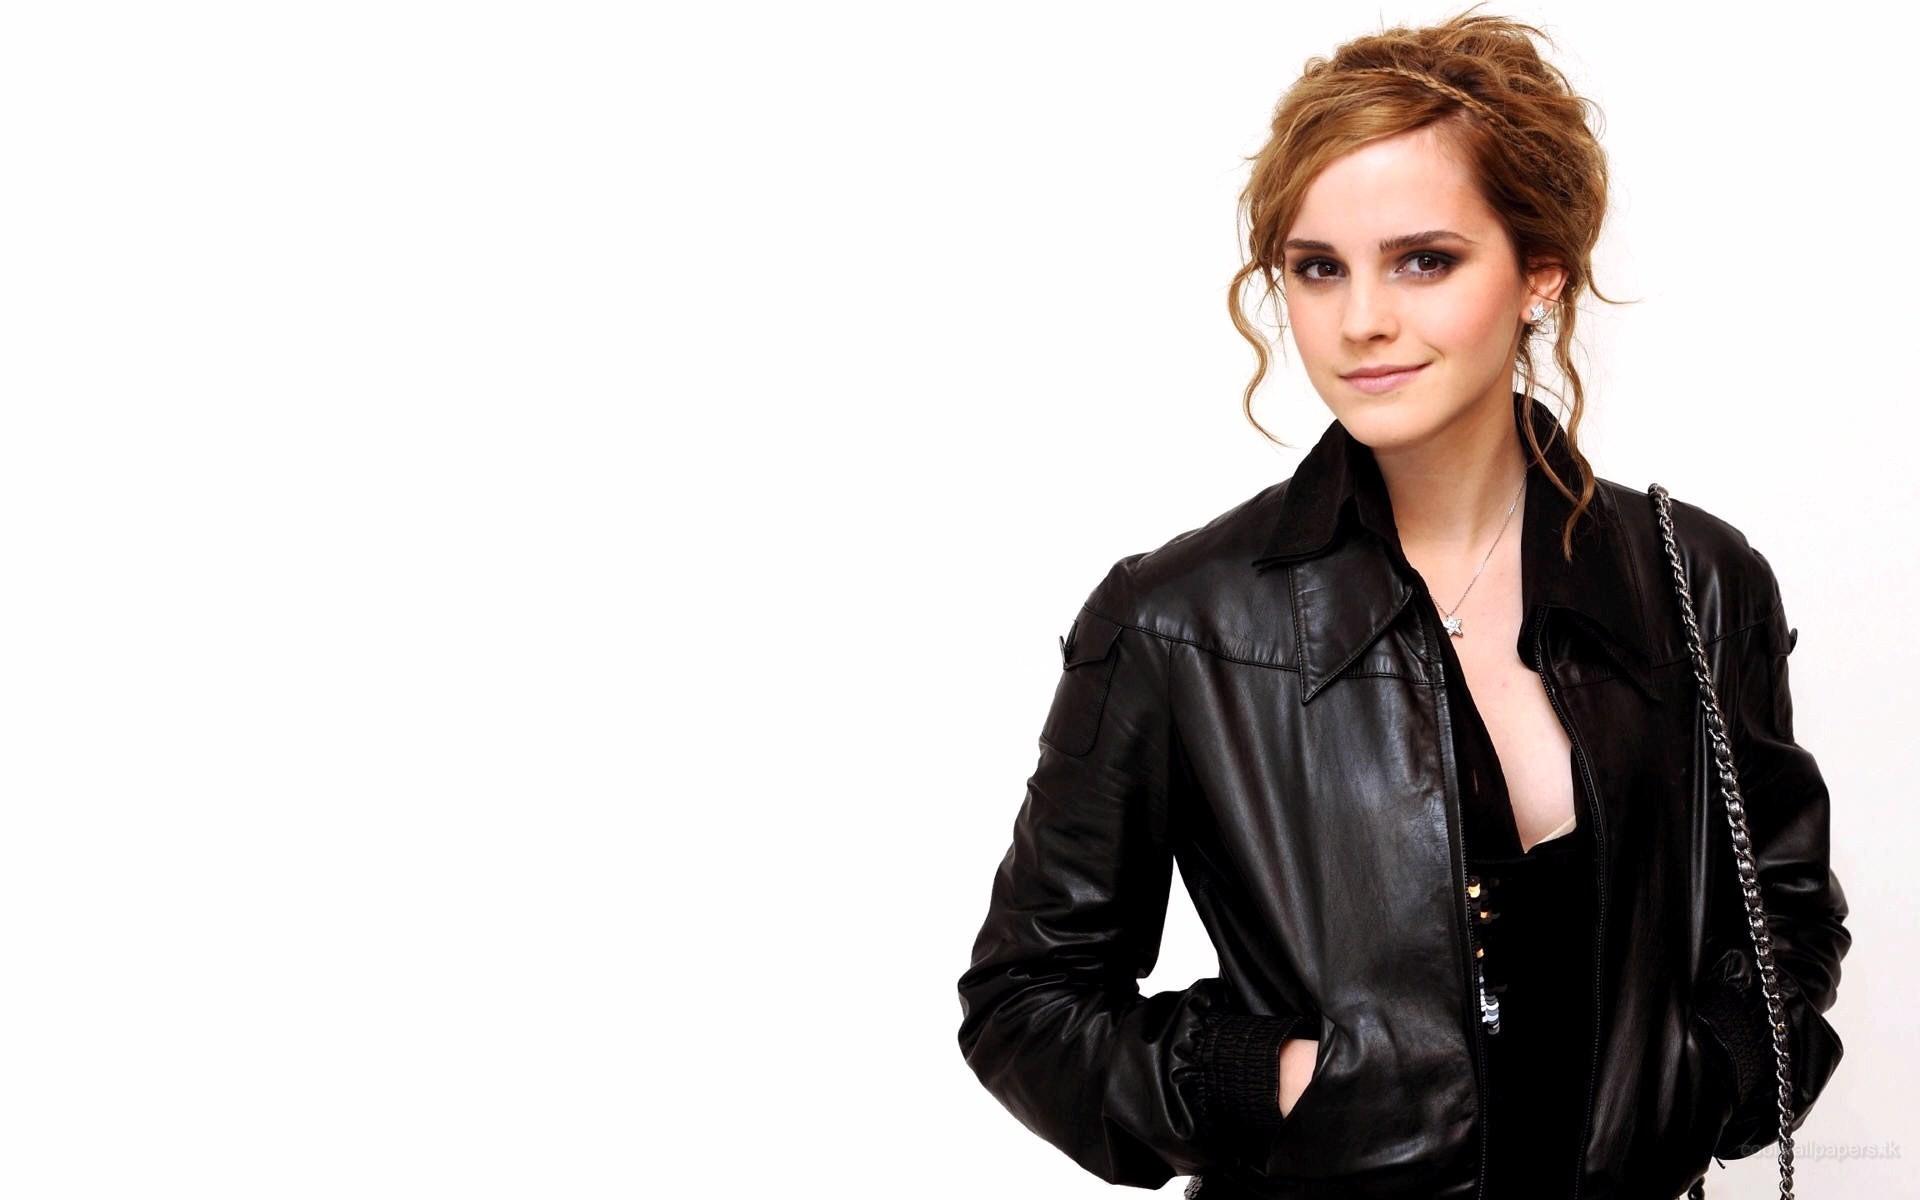 1920x1200 Emma Watson Iphone Wallpaper Tumblr